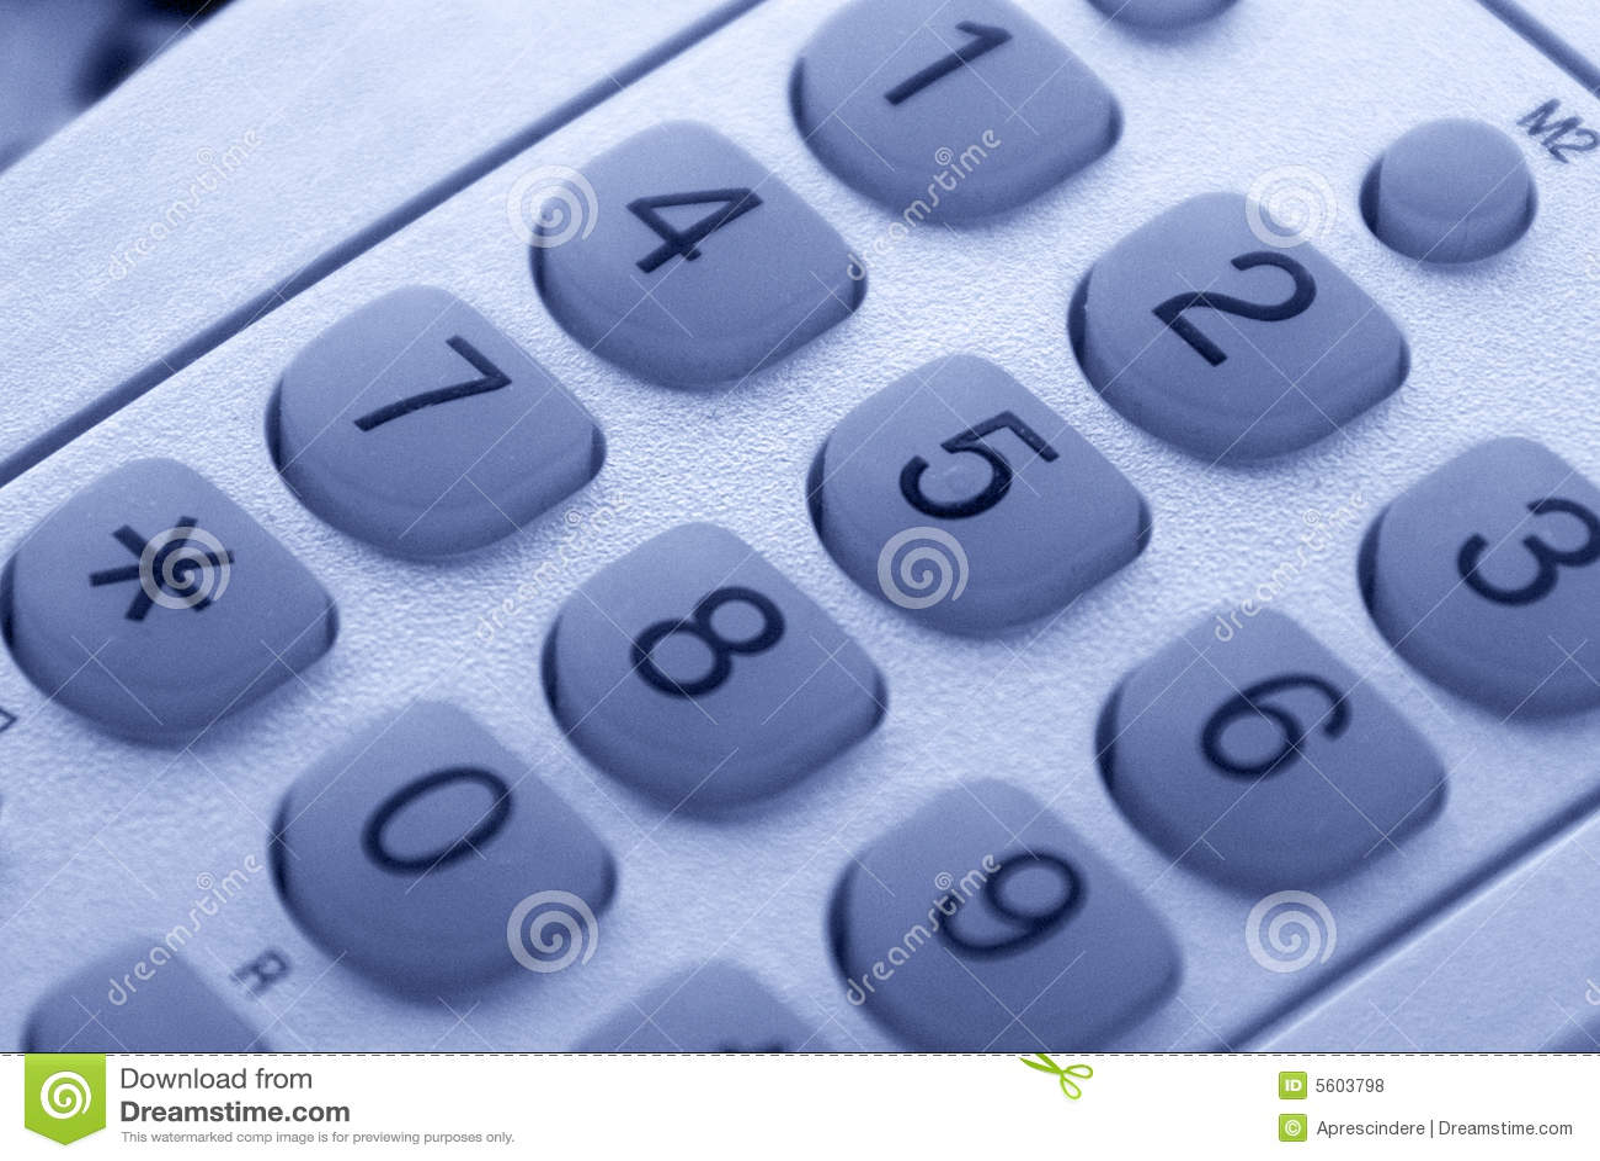 Telephone keys